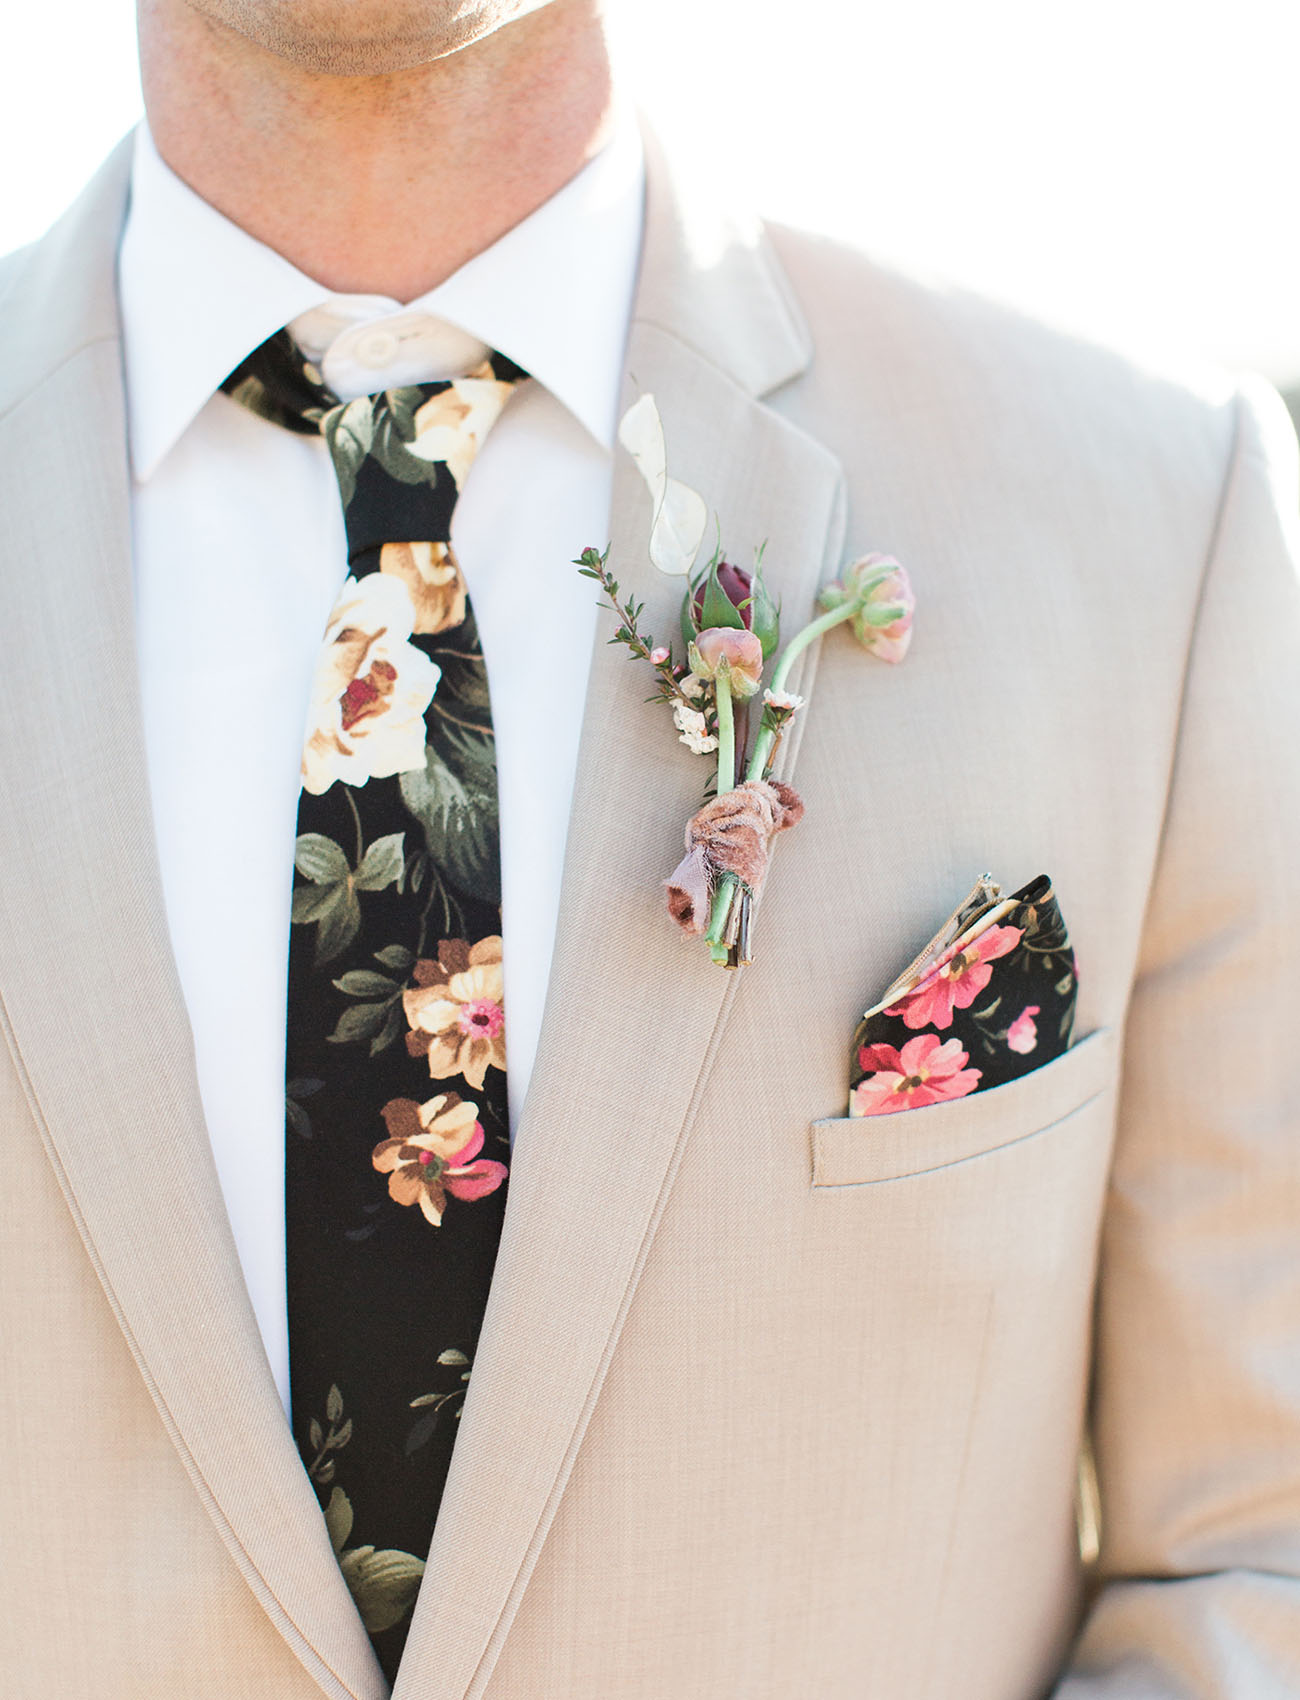 Colorful groom's tie